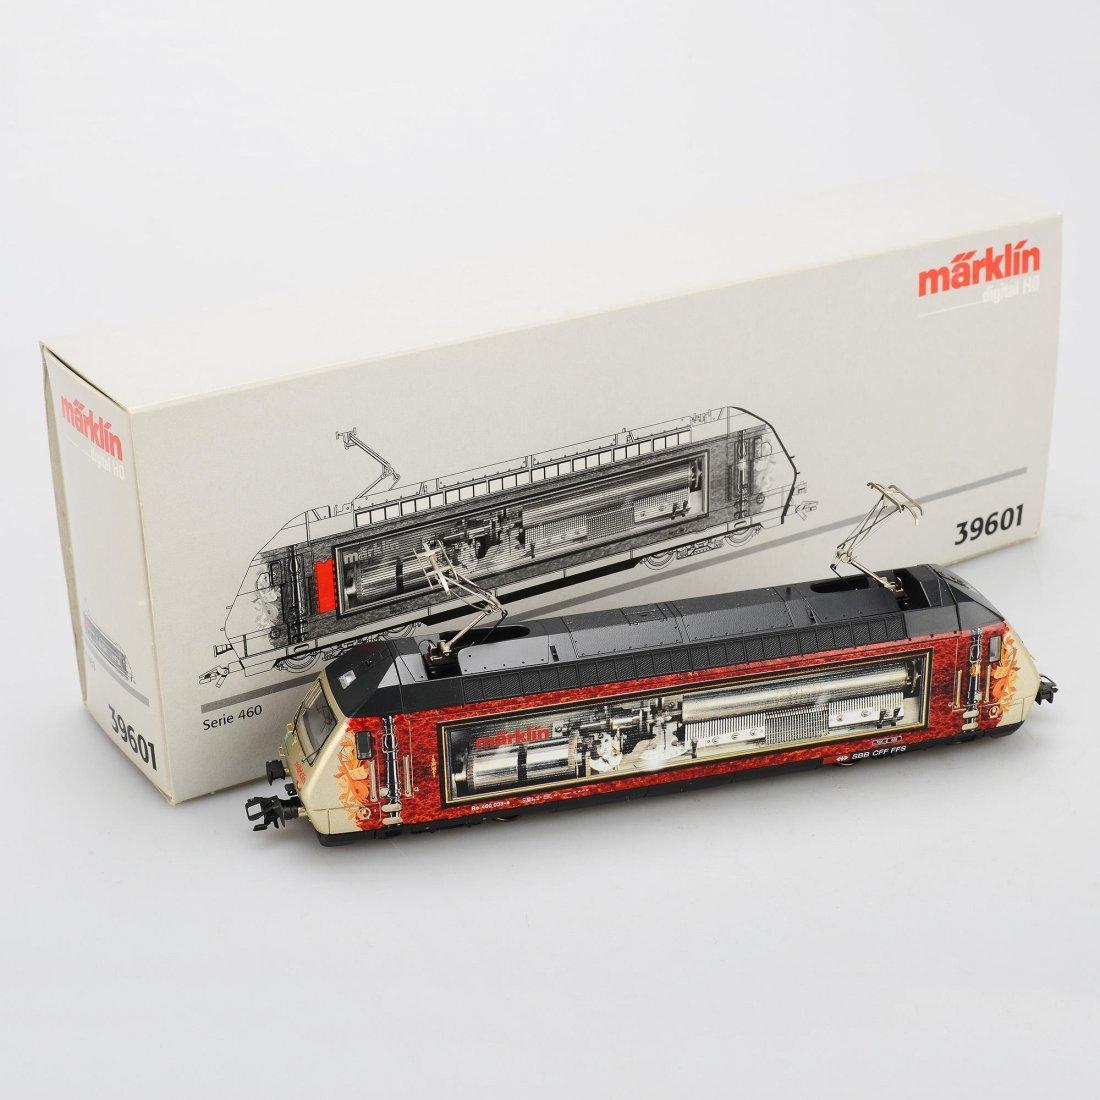 ELLOK, 39601, Marklin, Digital H0